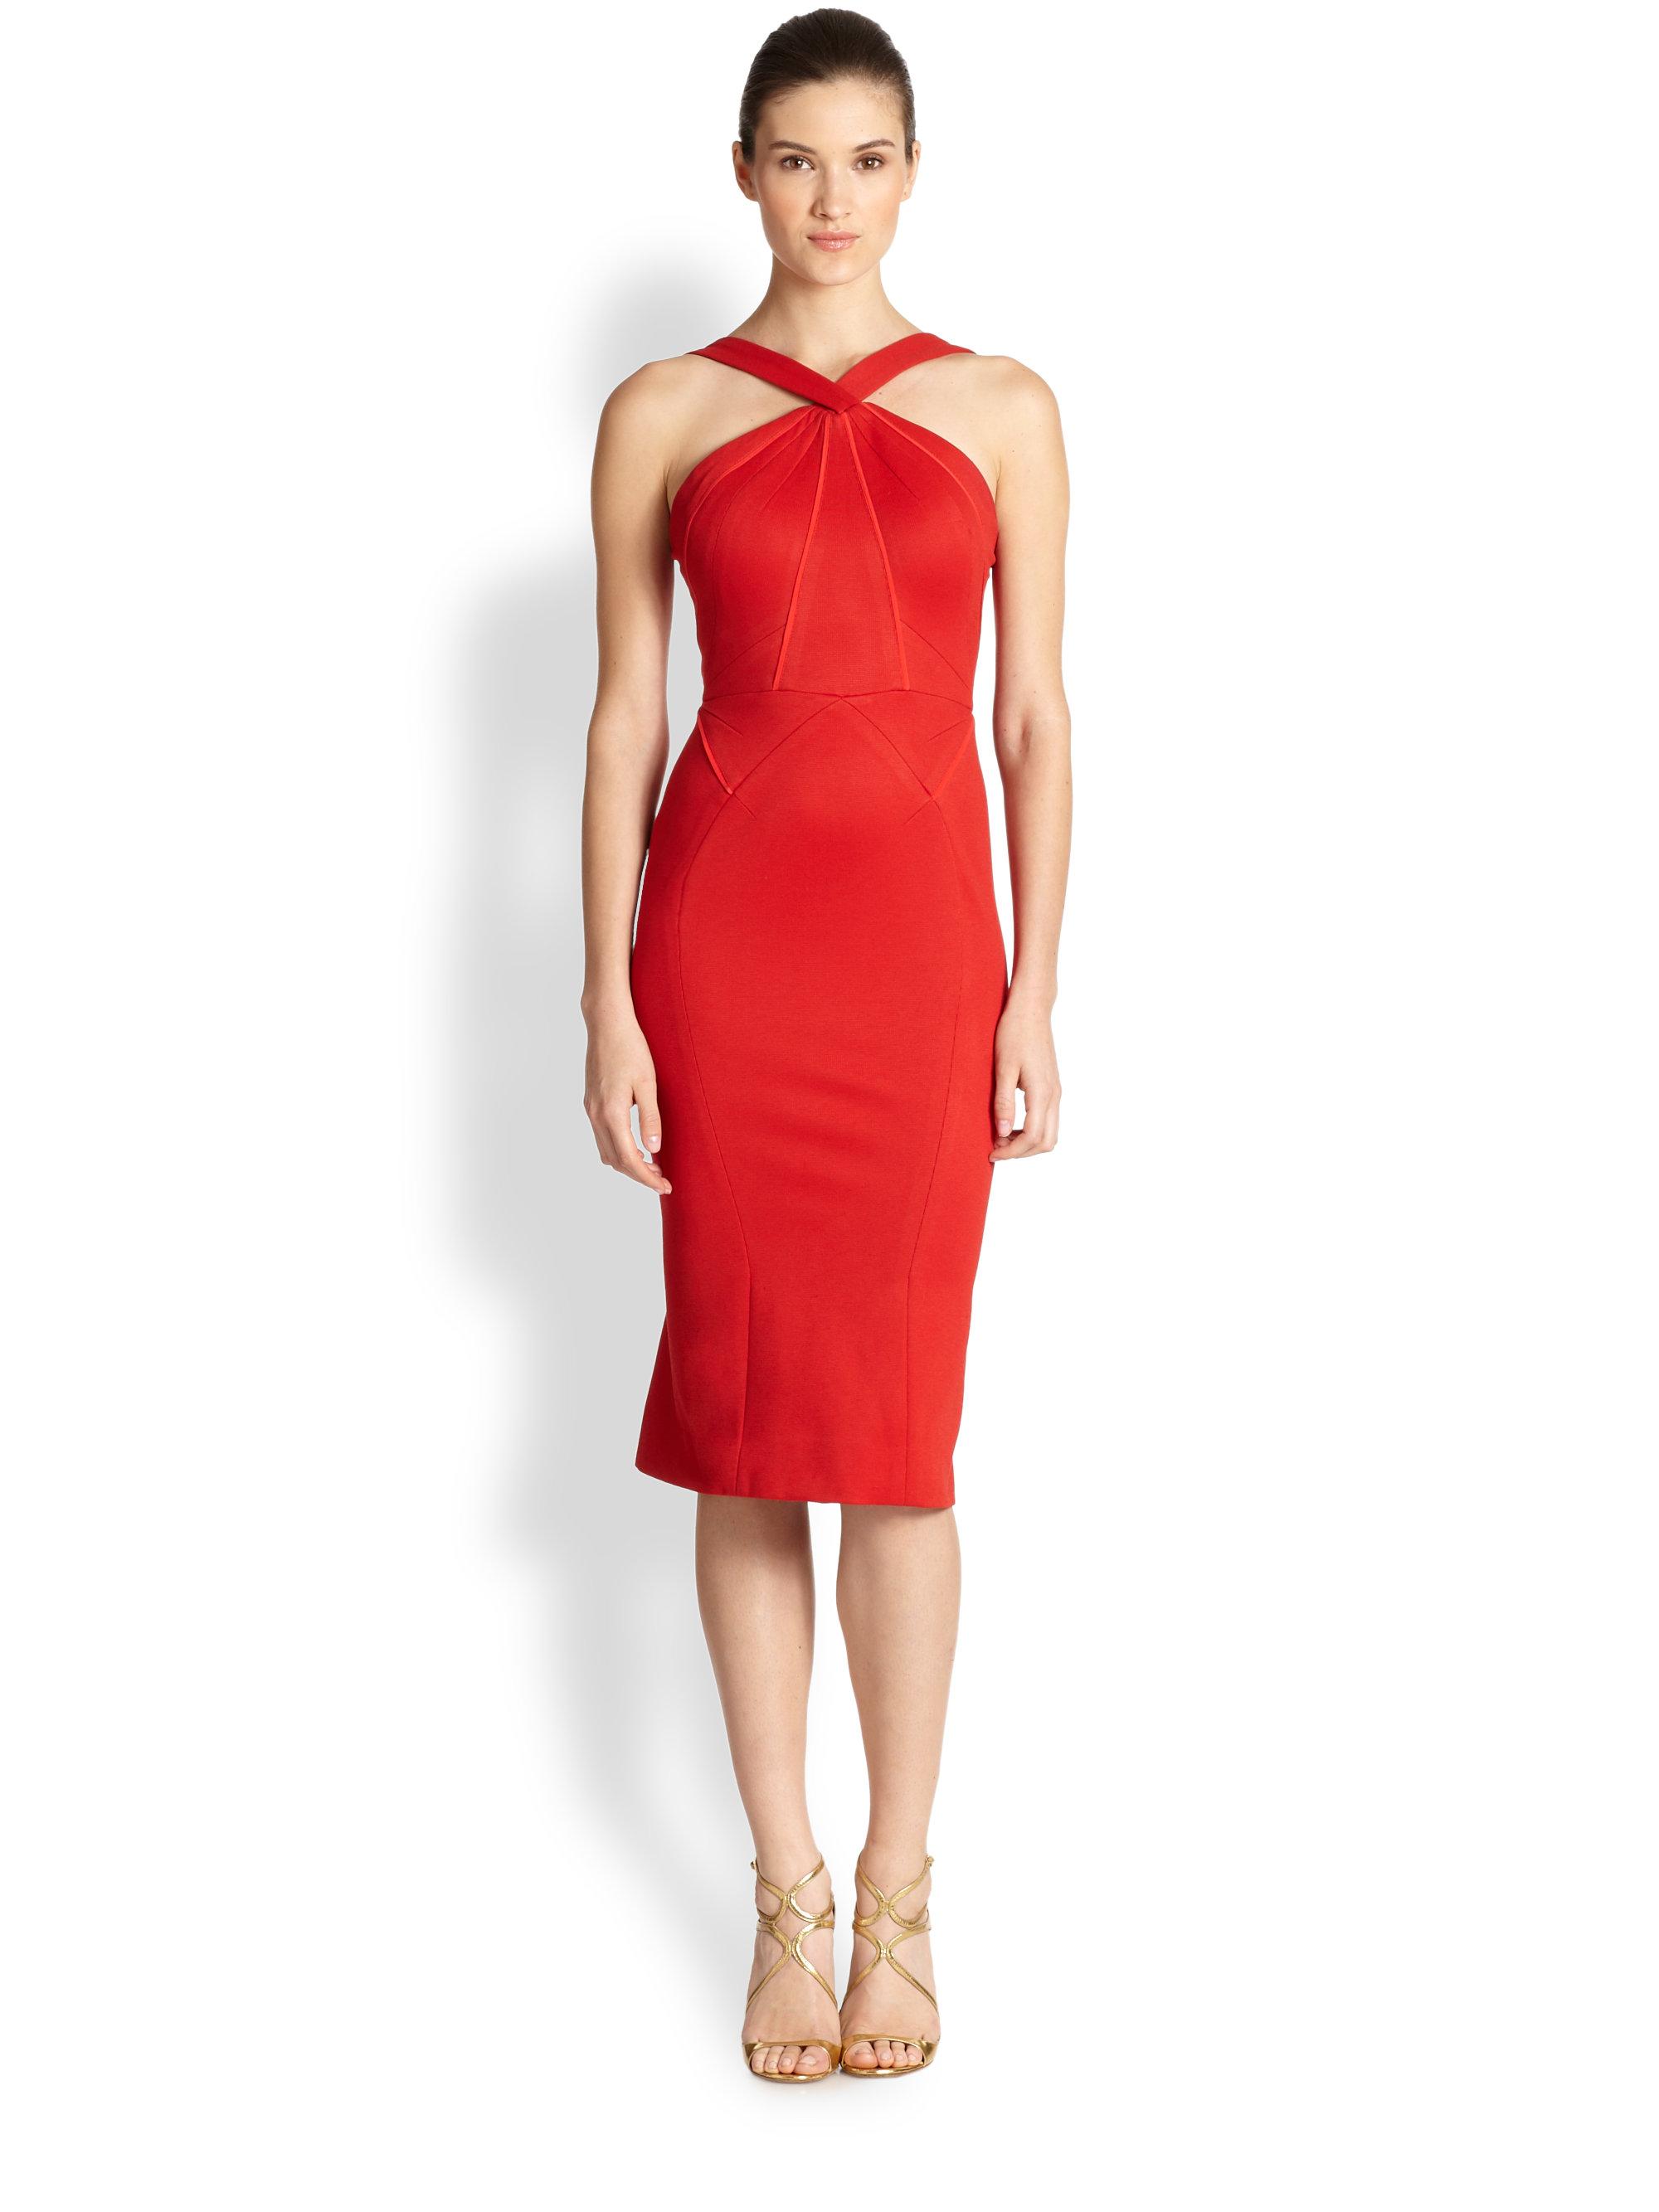 Lyst Zac Posen Binding Halter Dress In Red